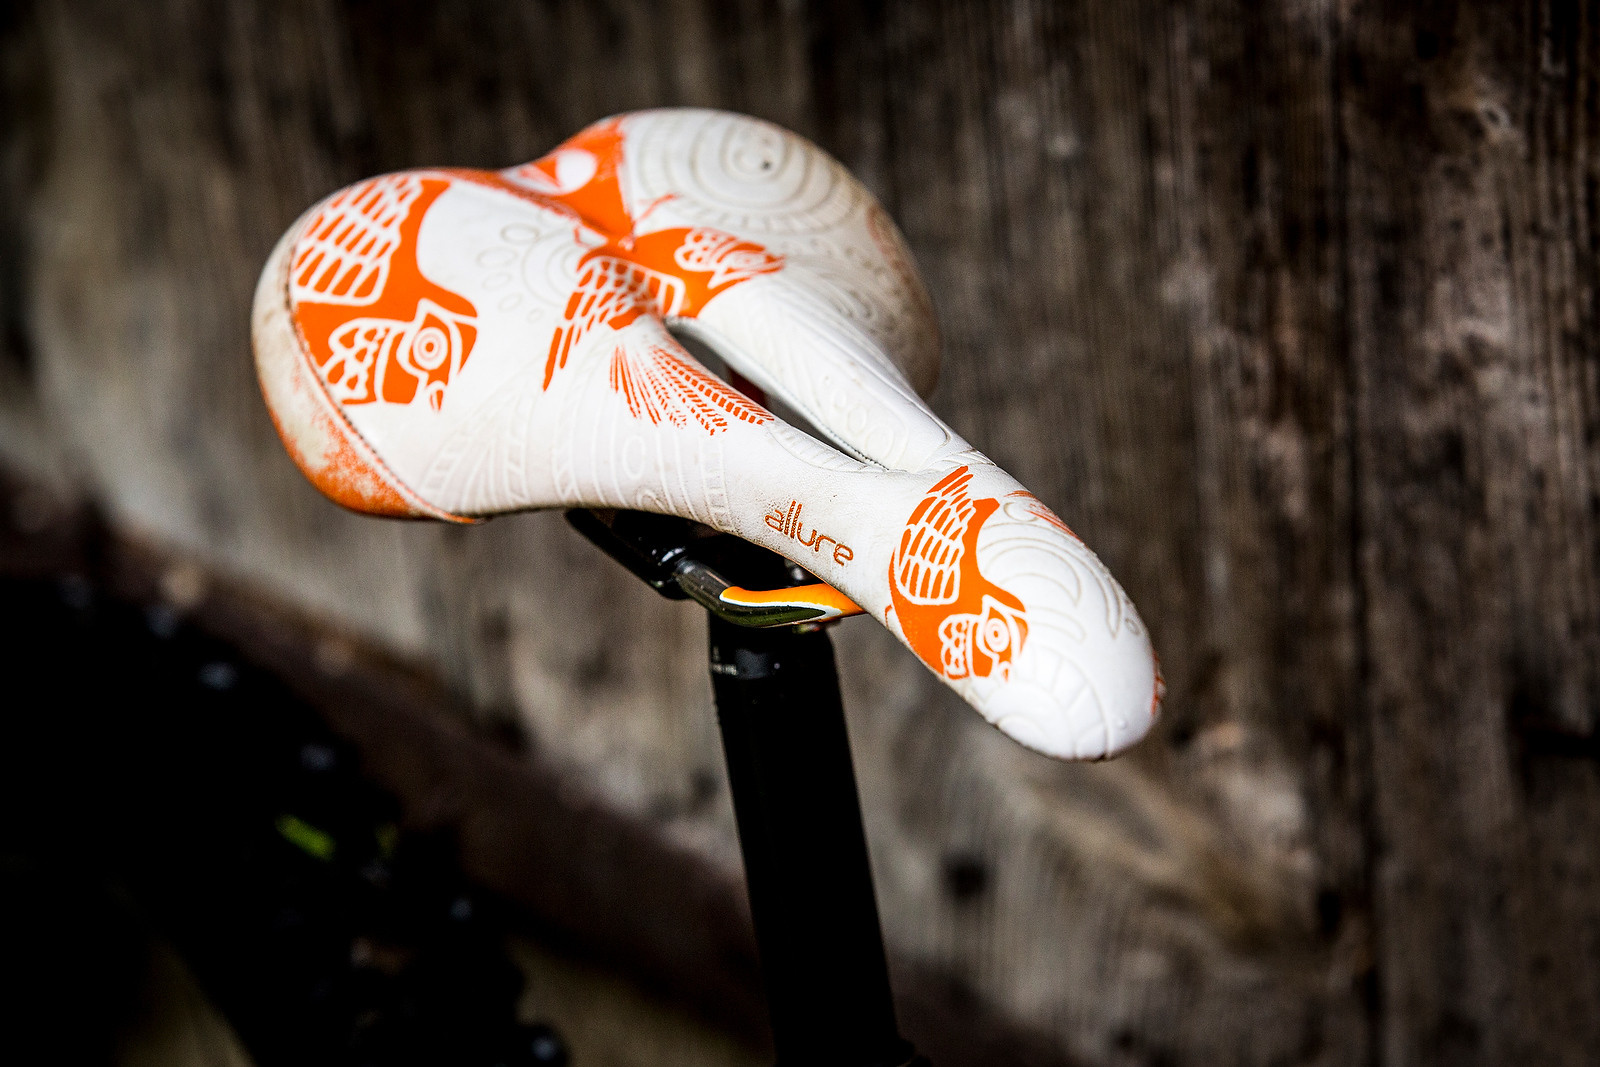 SDG Women's Alure Saddle Designed by Anka Martin - WINNING BIKE: Anka Martin's Custom 150mm-travel Juliana Furtado - Mountain Biking Pictures - Vital MTB